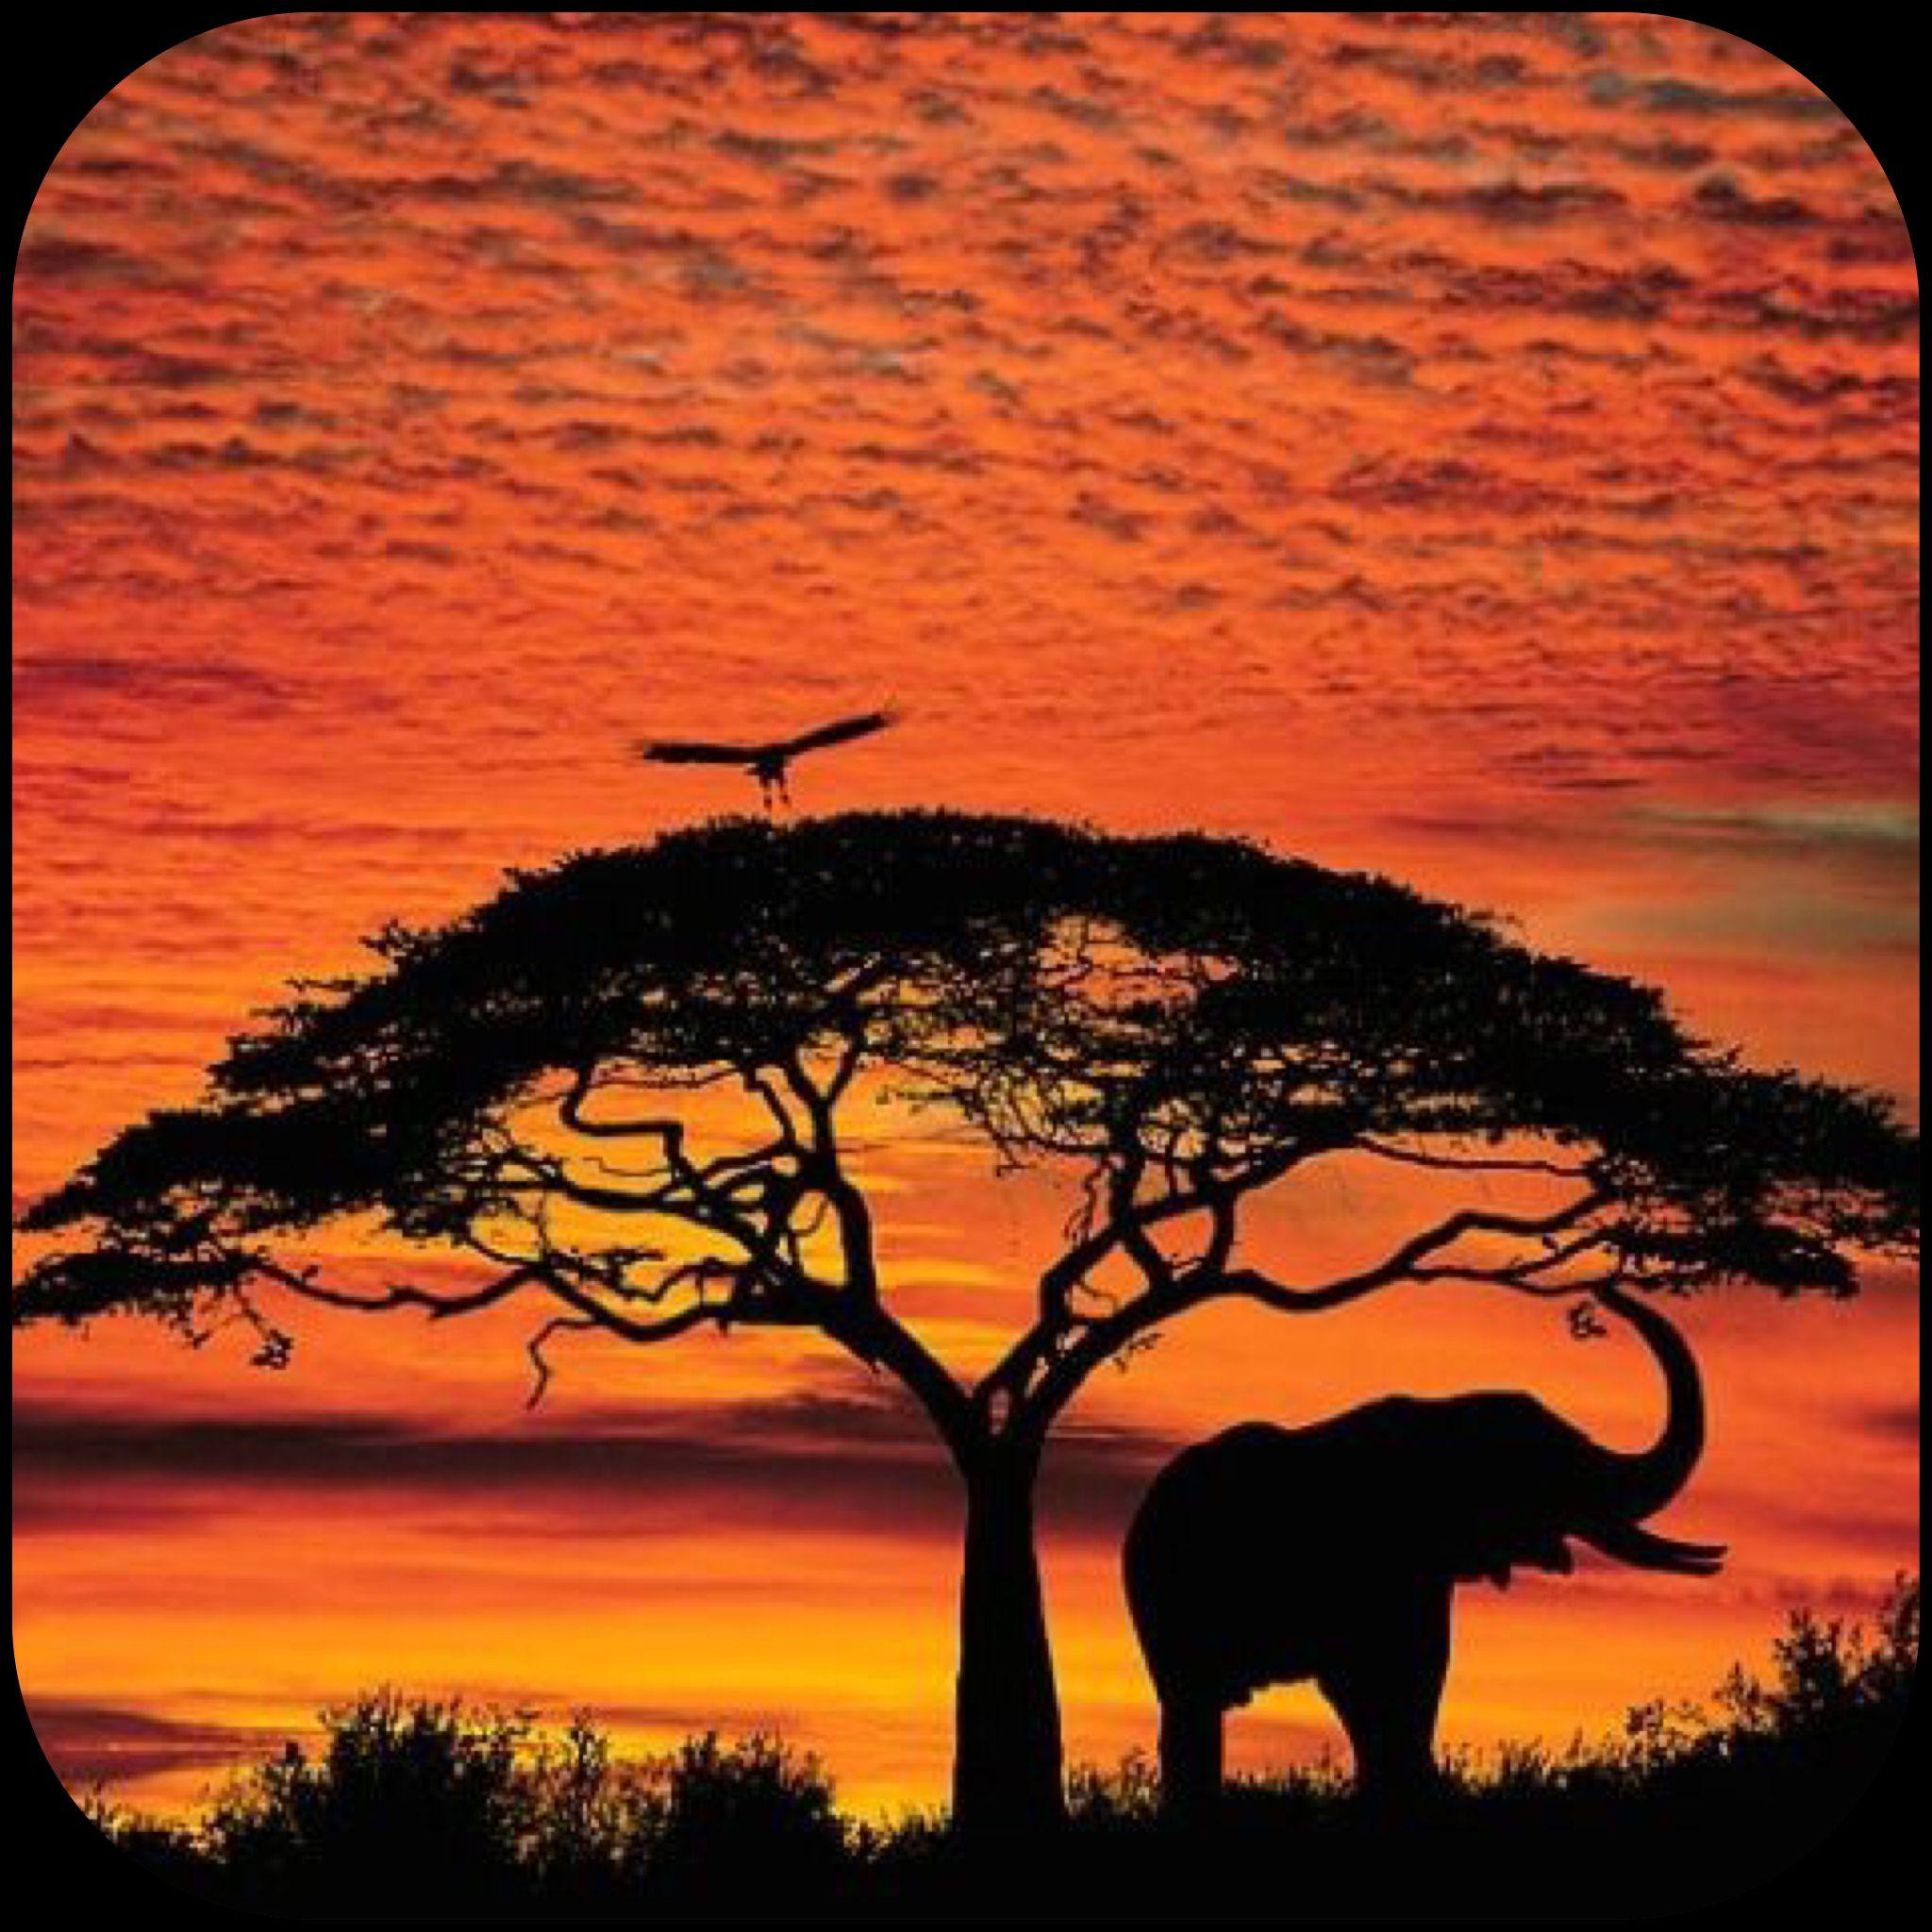 Baobab tree at africa madagascar and australia